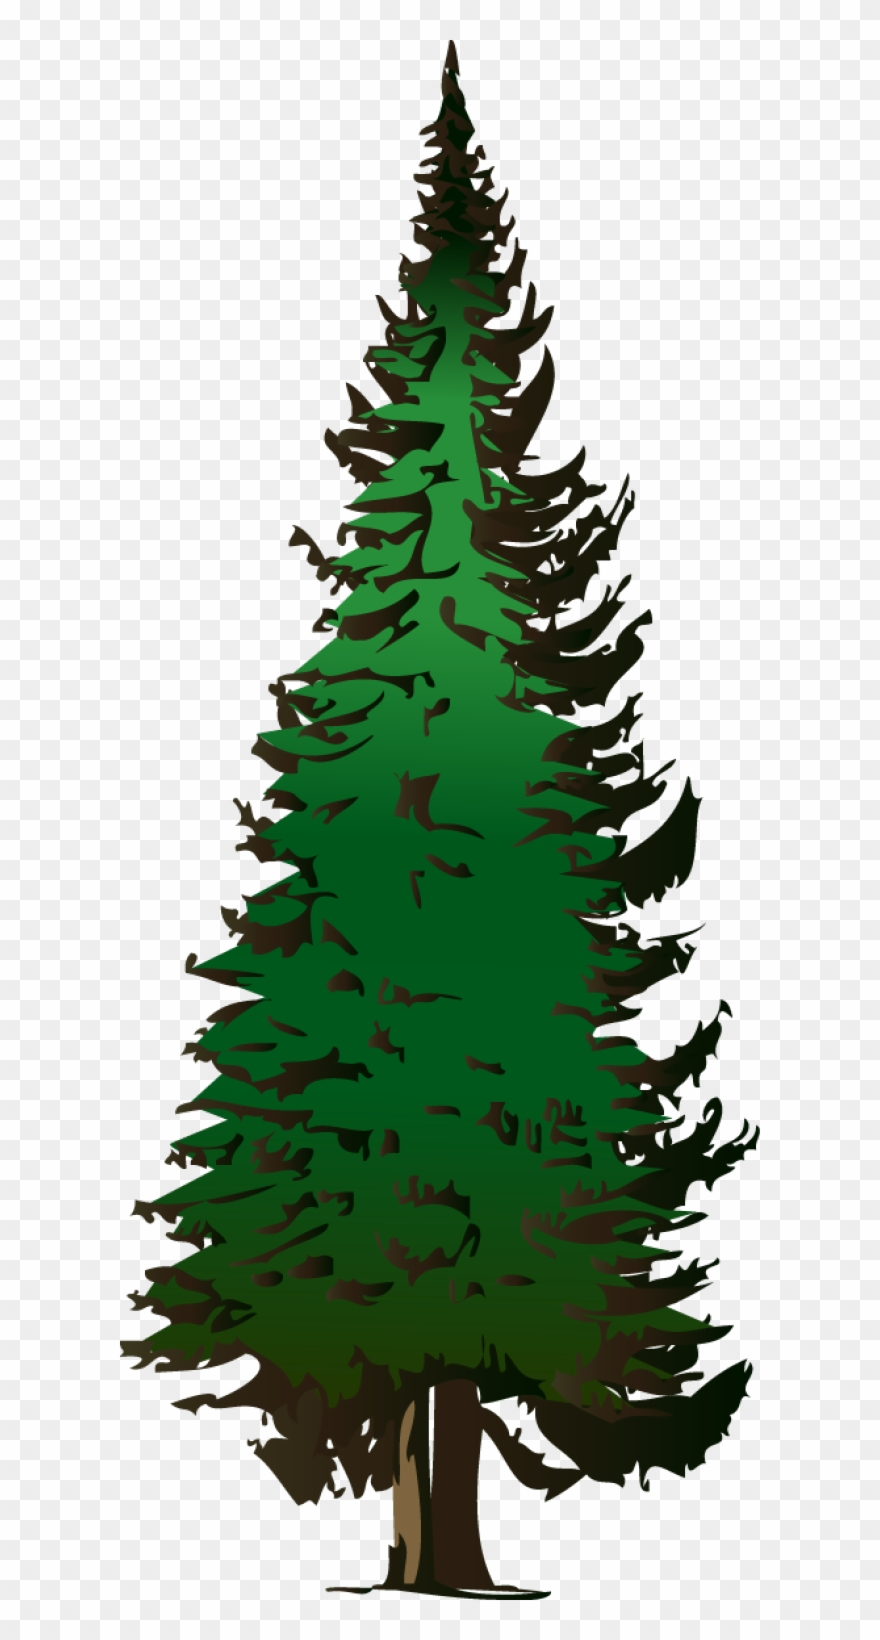 Pine Tree Vector Free Download.